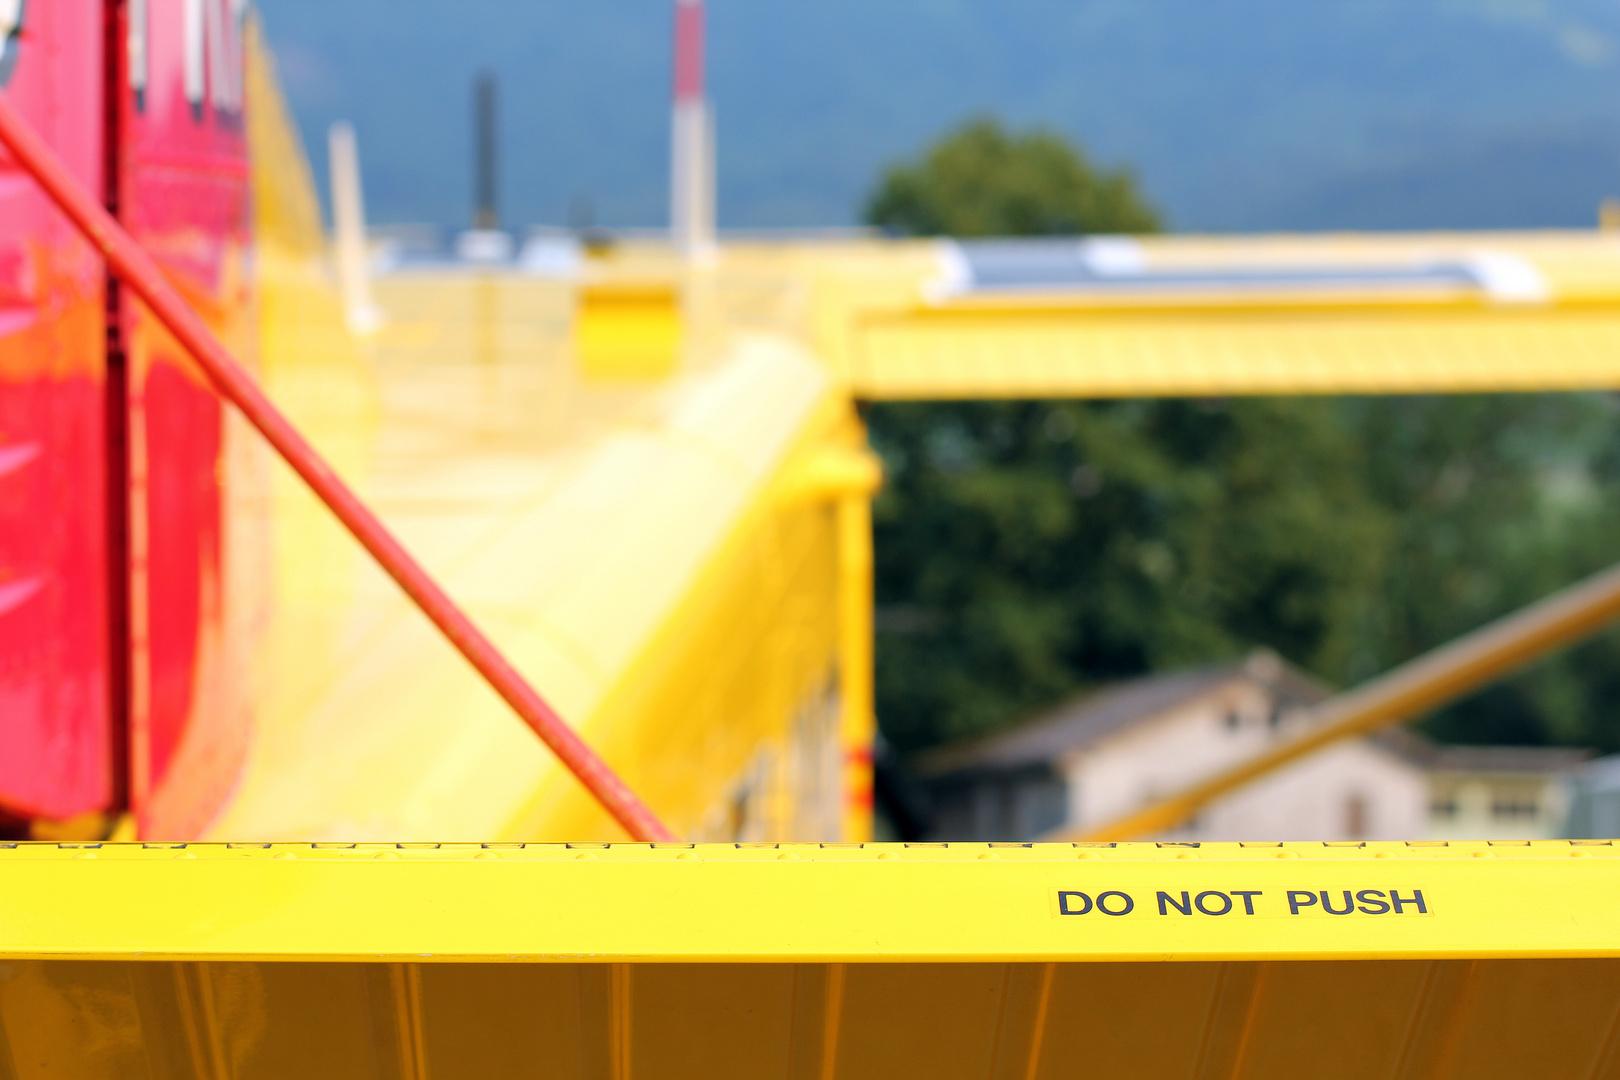 Do not push...